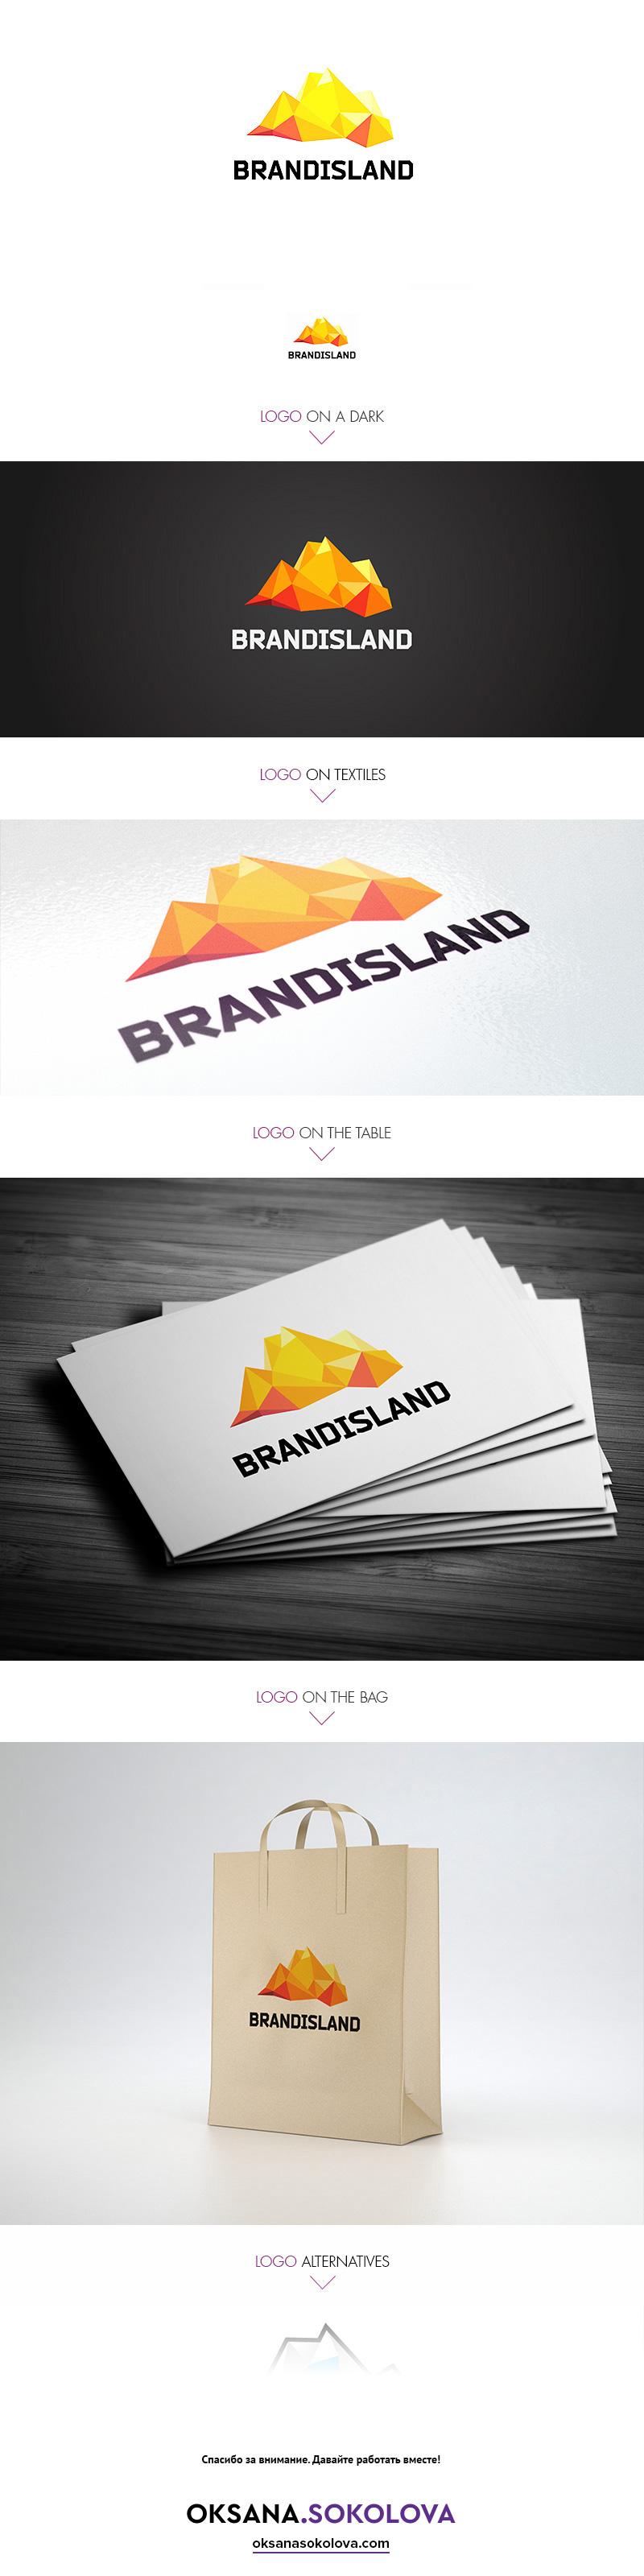 Brandisland